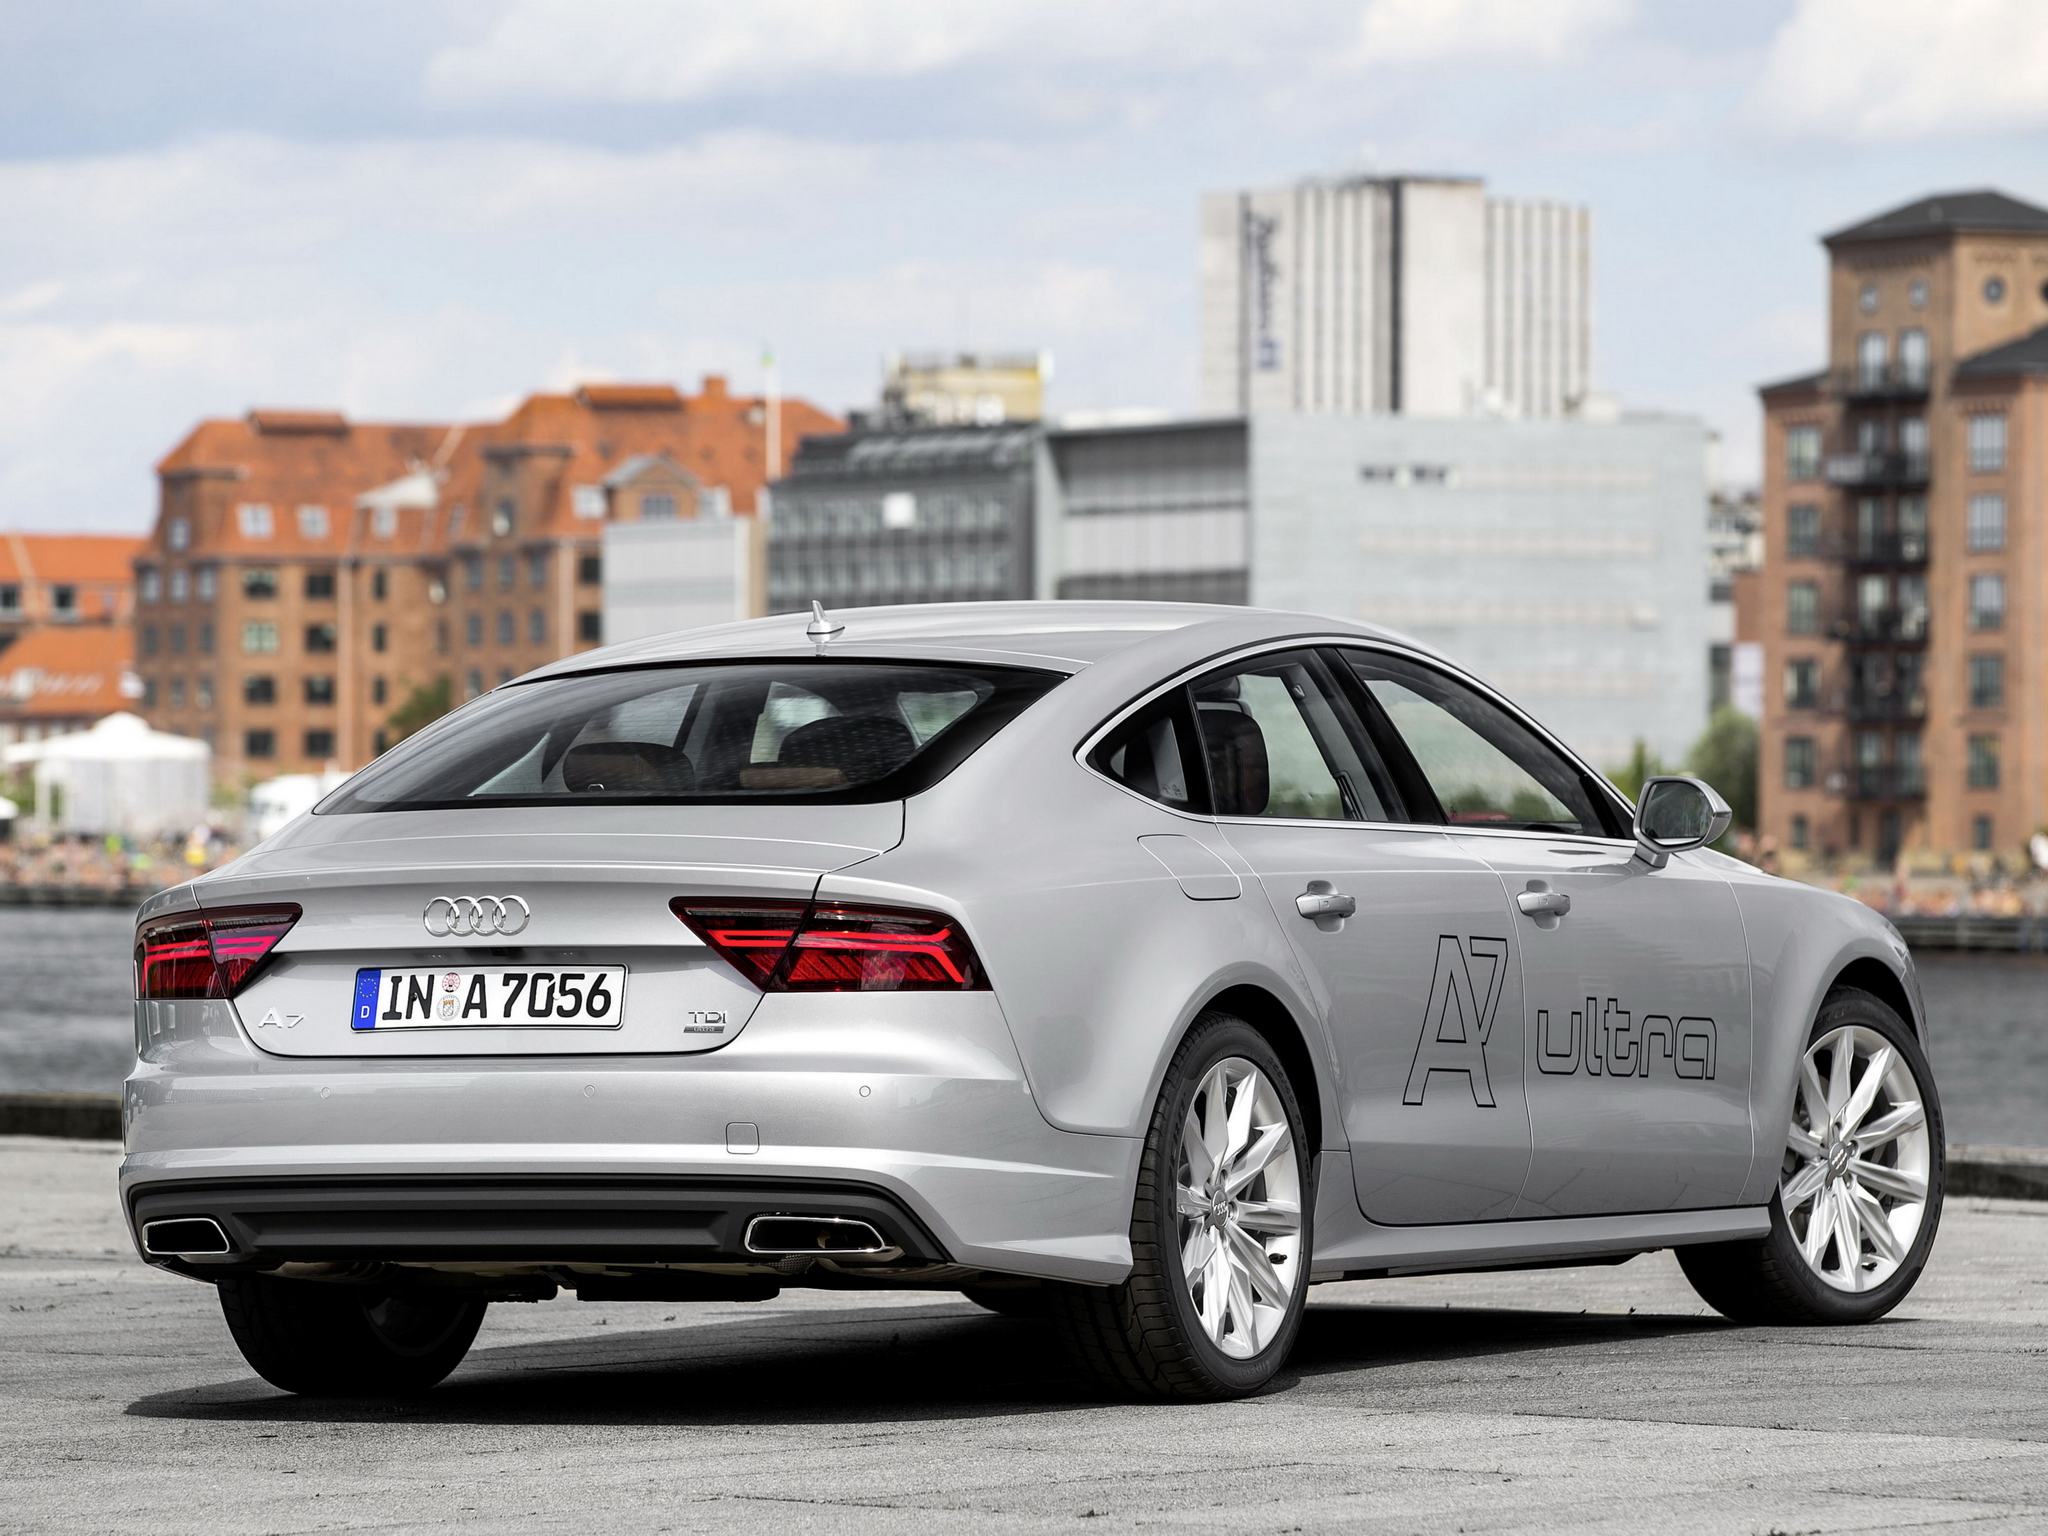 Audi R8 2014 Models 2014 Audi A7 3.0 TDI u...